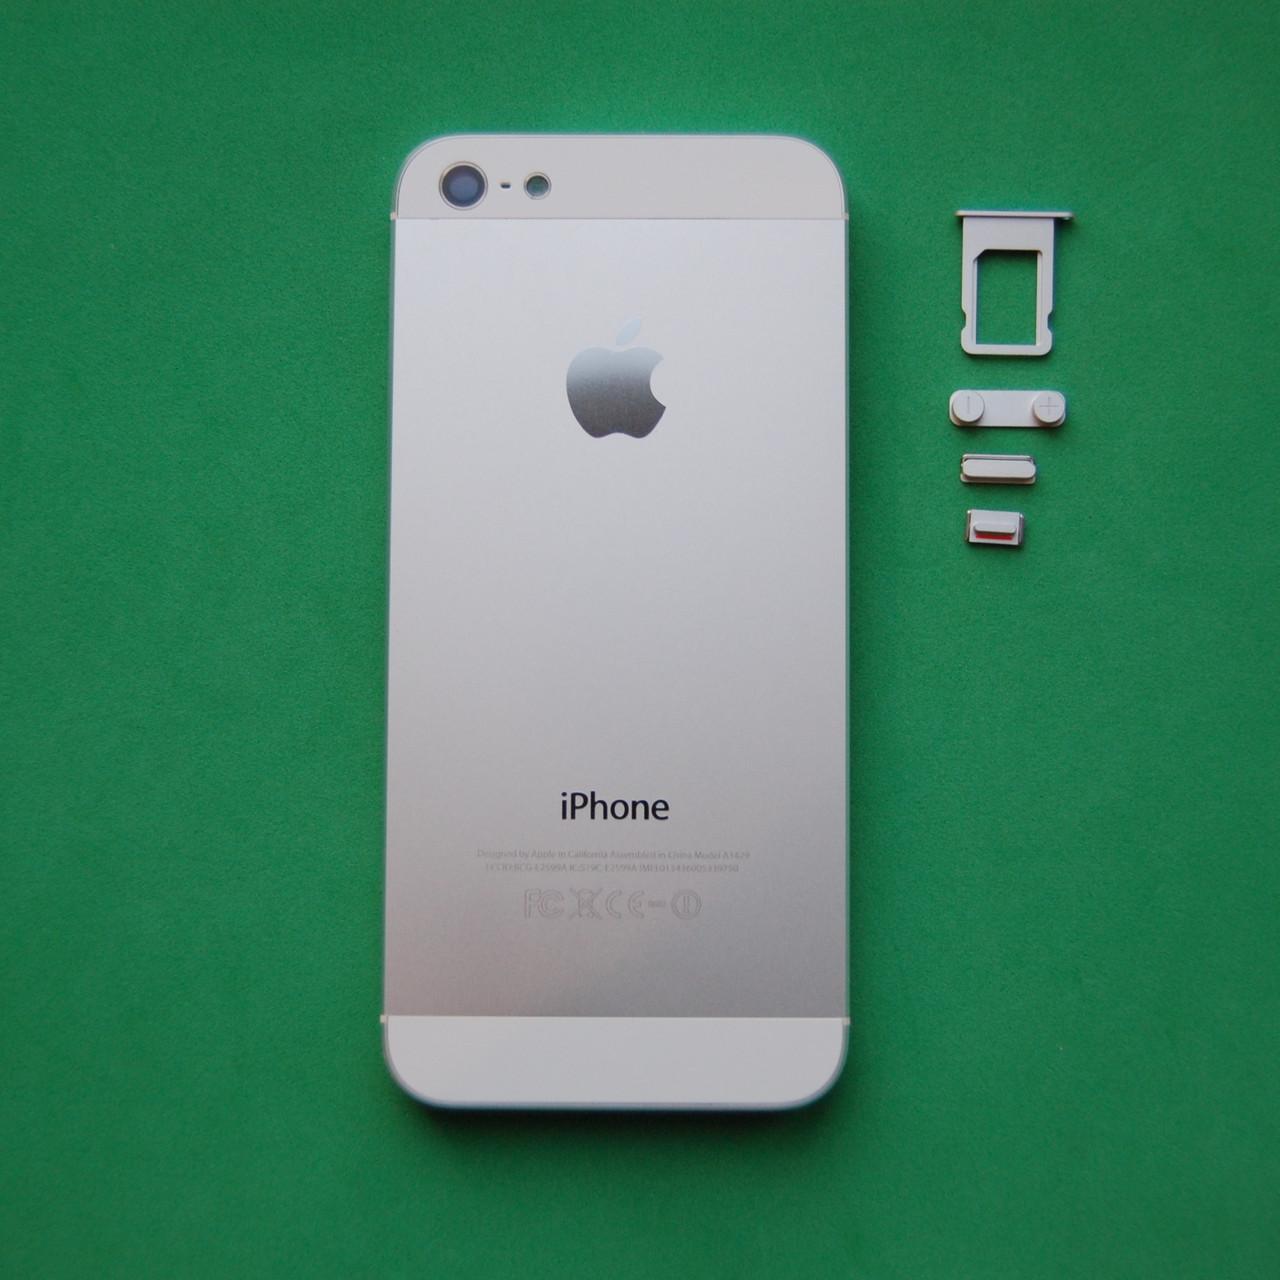 цена iphone 5 из харькове